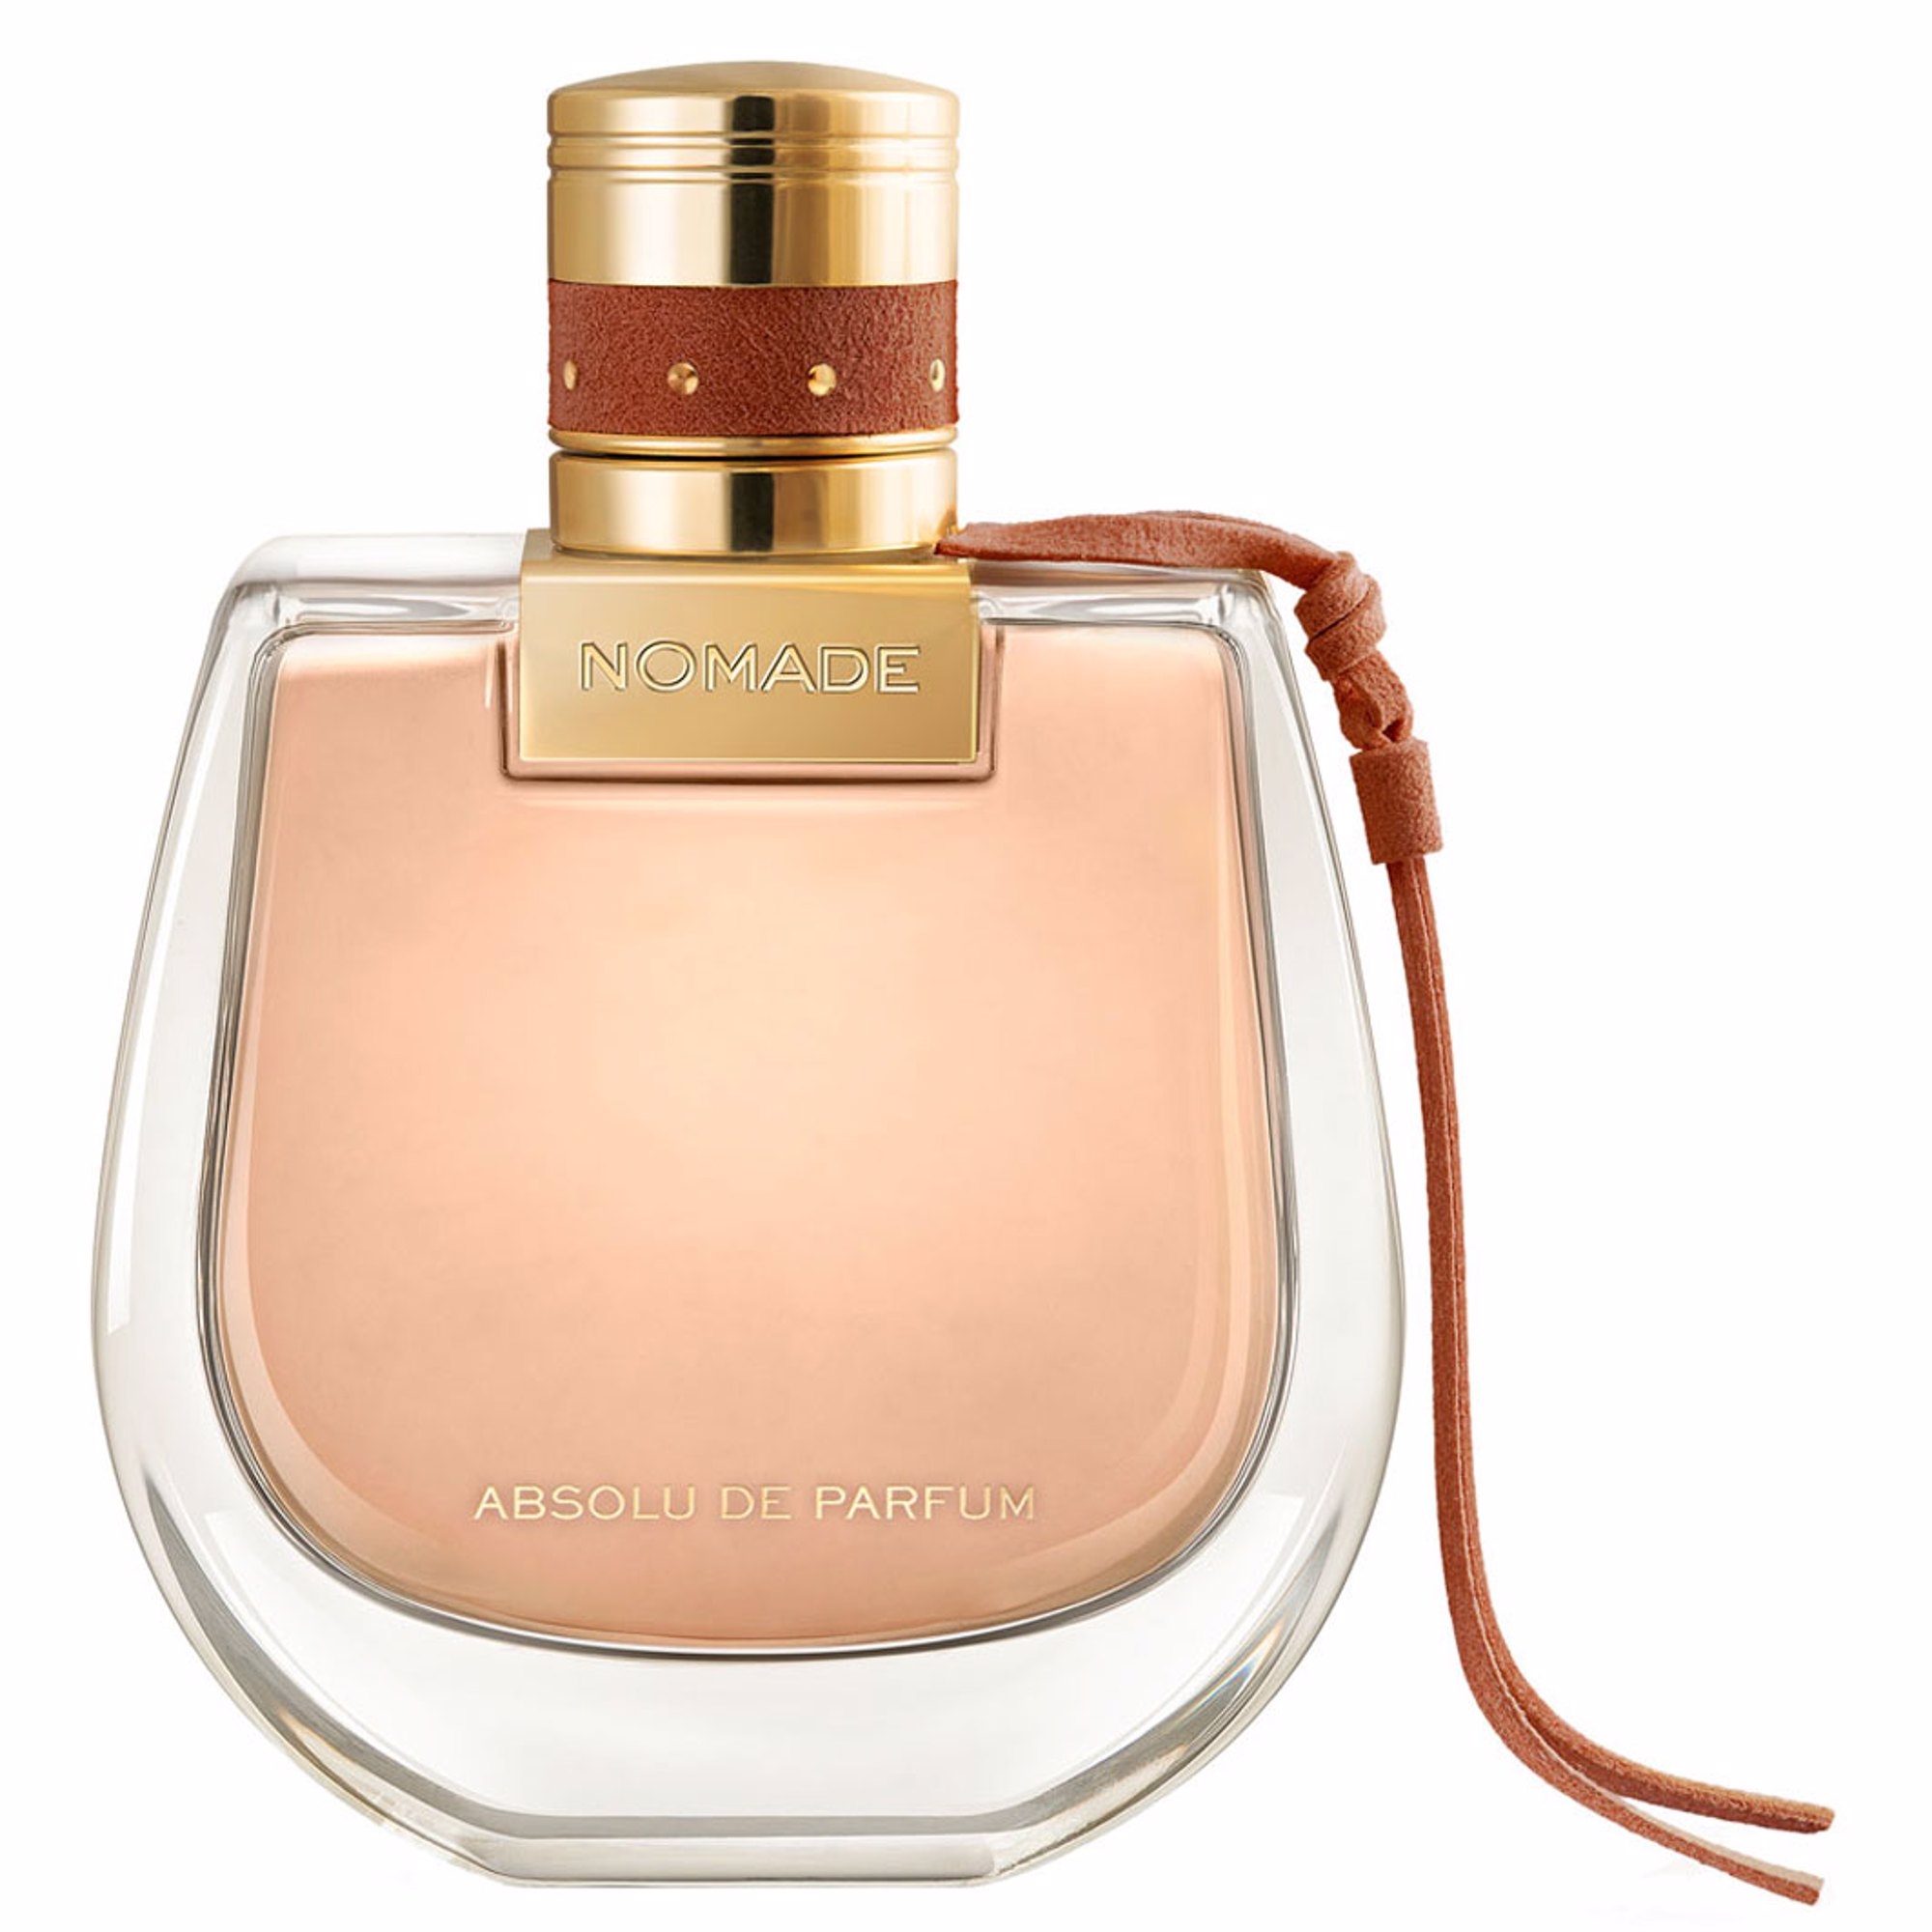 Nomade Absolu Eau de Parfum